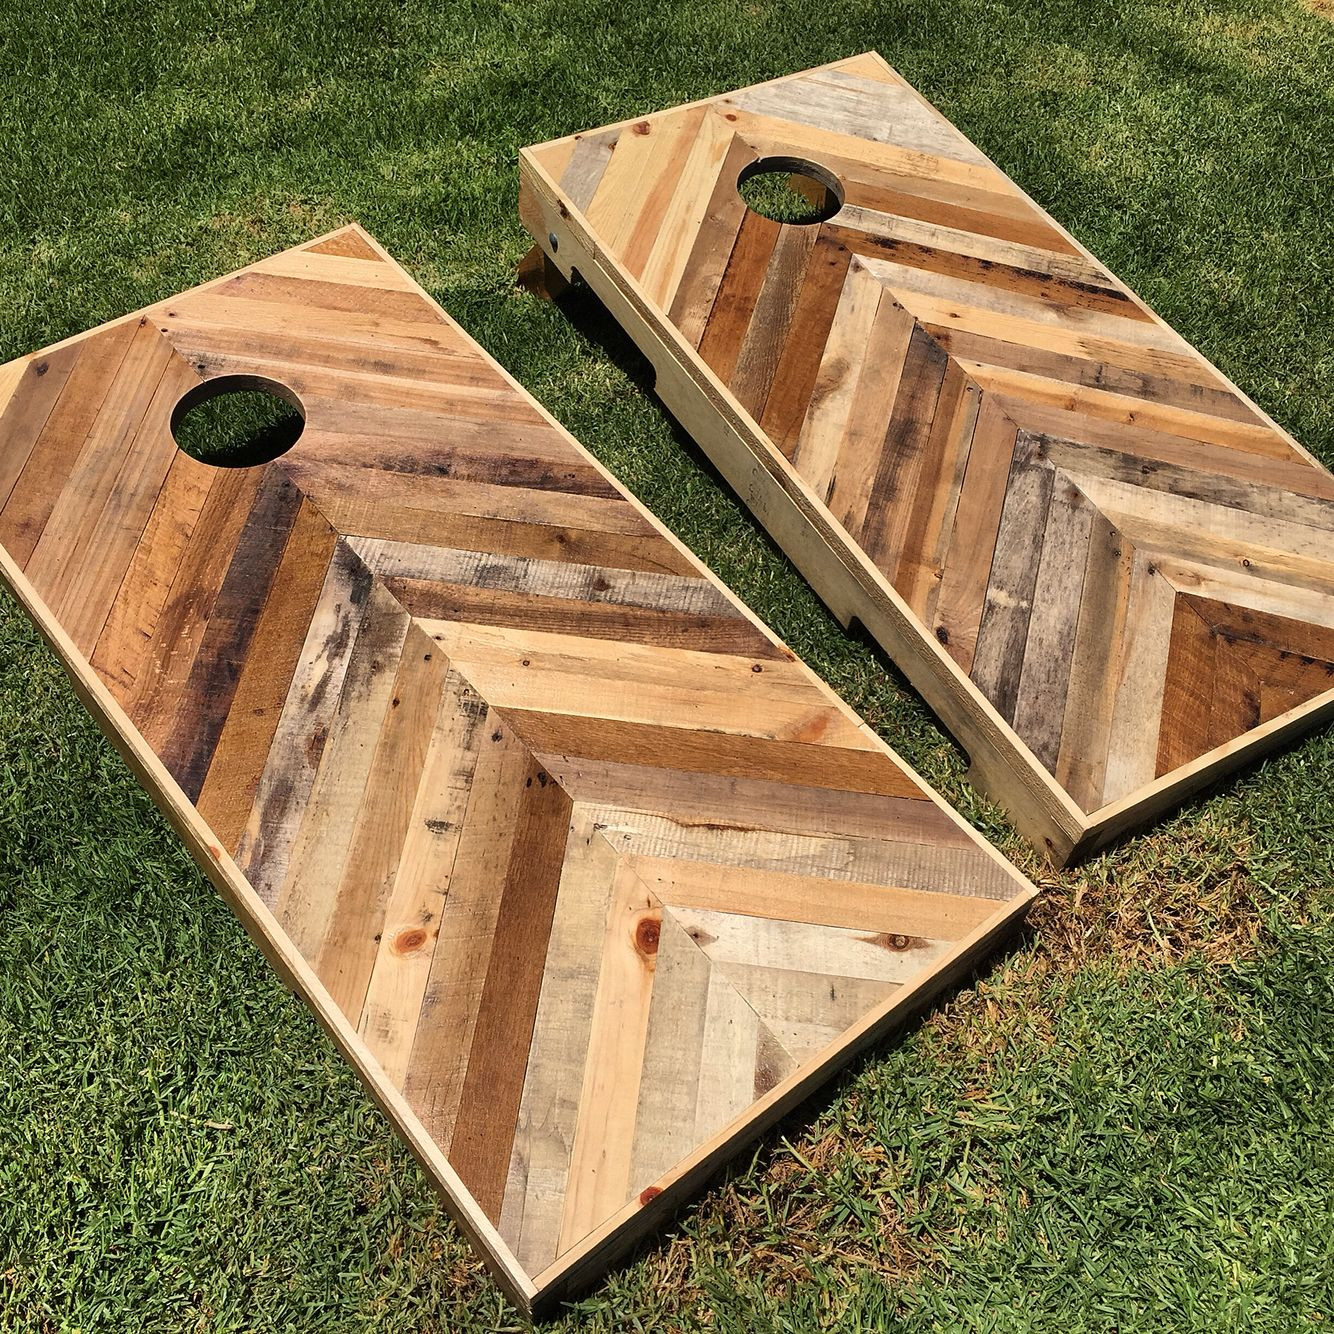 Best ideas about DIY Cornhole Plans . Save or Pin DIY pallet chevron cornhole boards Follow me on Instagram Now.